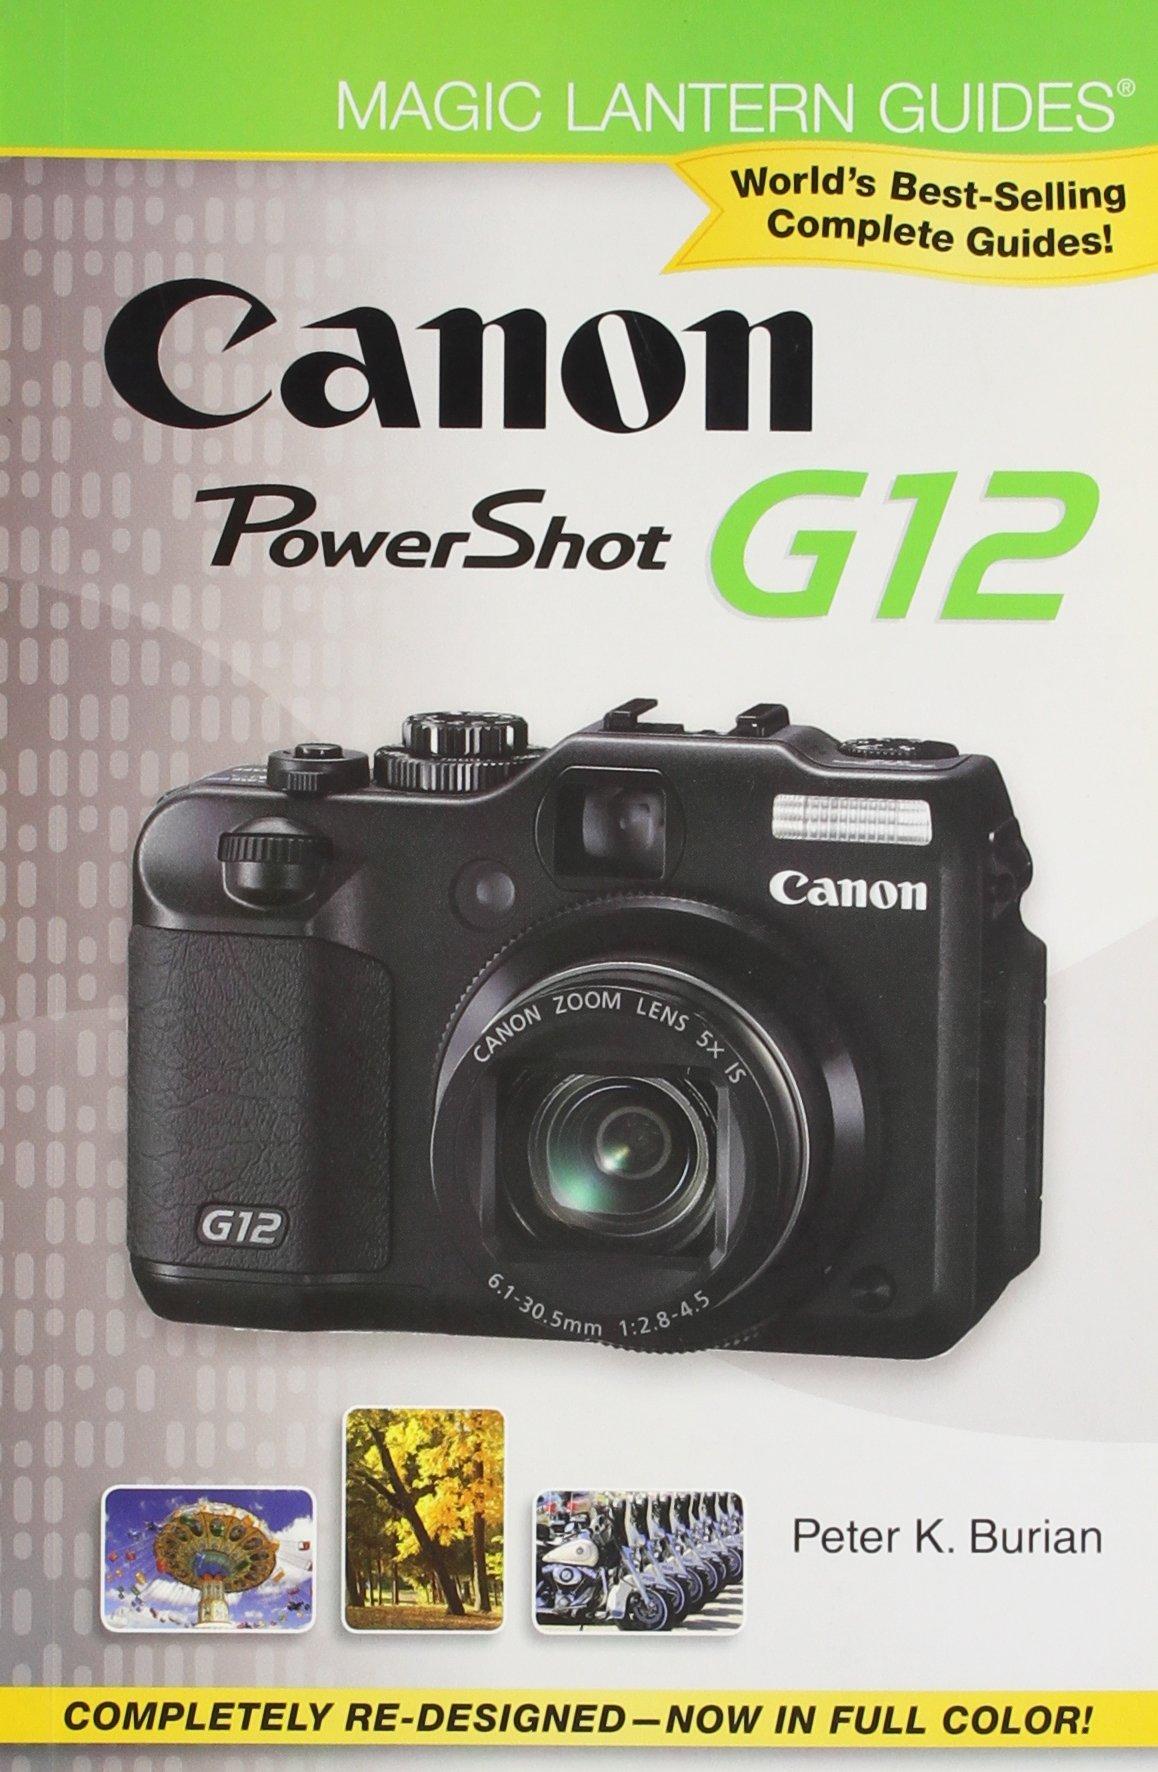 canon powershot g12 owners manual open source user manual u2022 rh dramatic varieties com canon g12 owners manual canon g12 instruction manual download